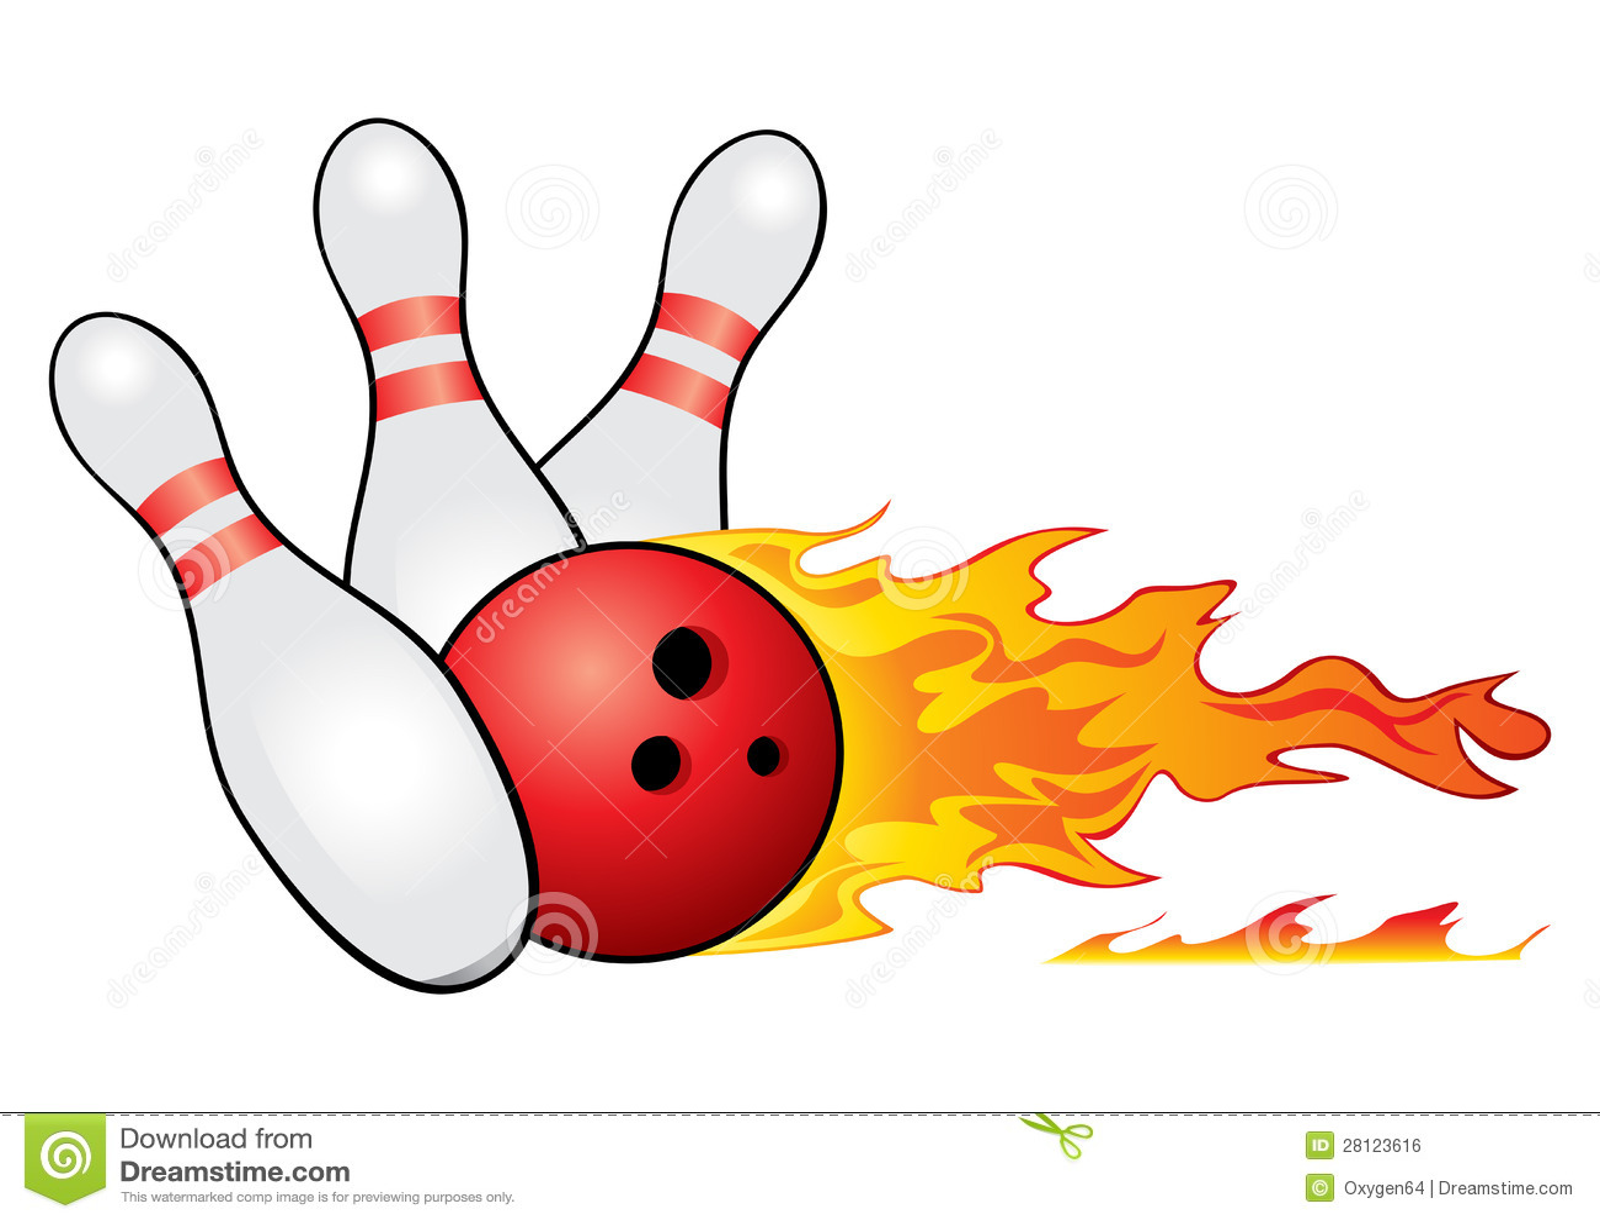 Bowling Symbol Royalty Free Stock Image - Image: 28123616